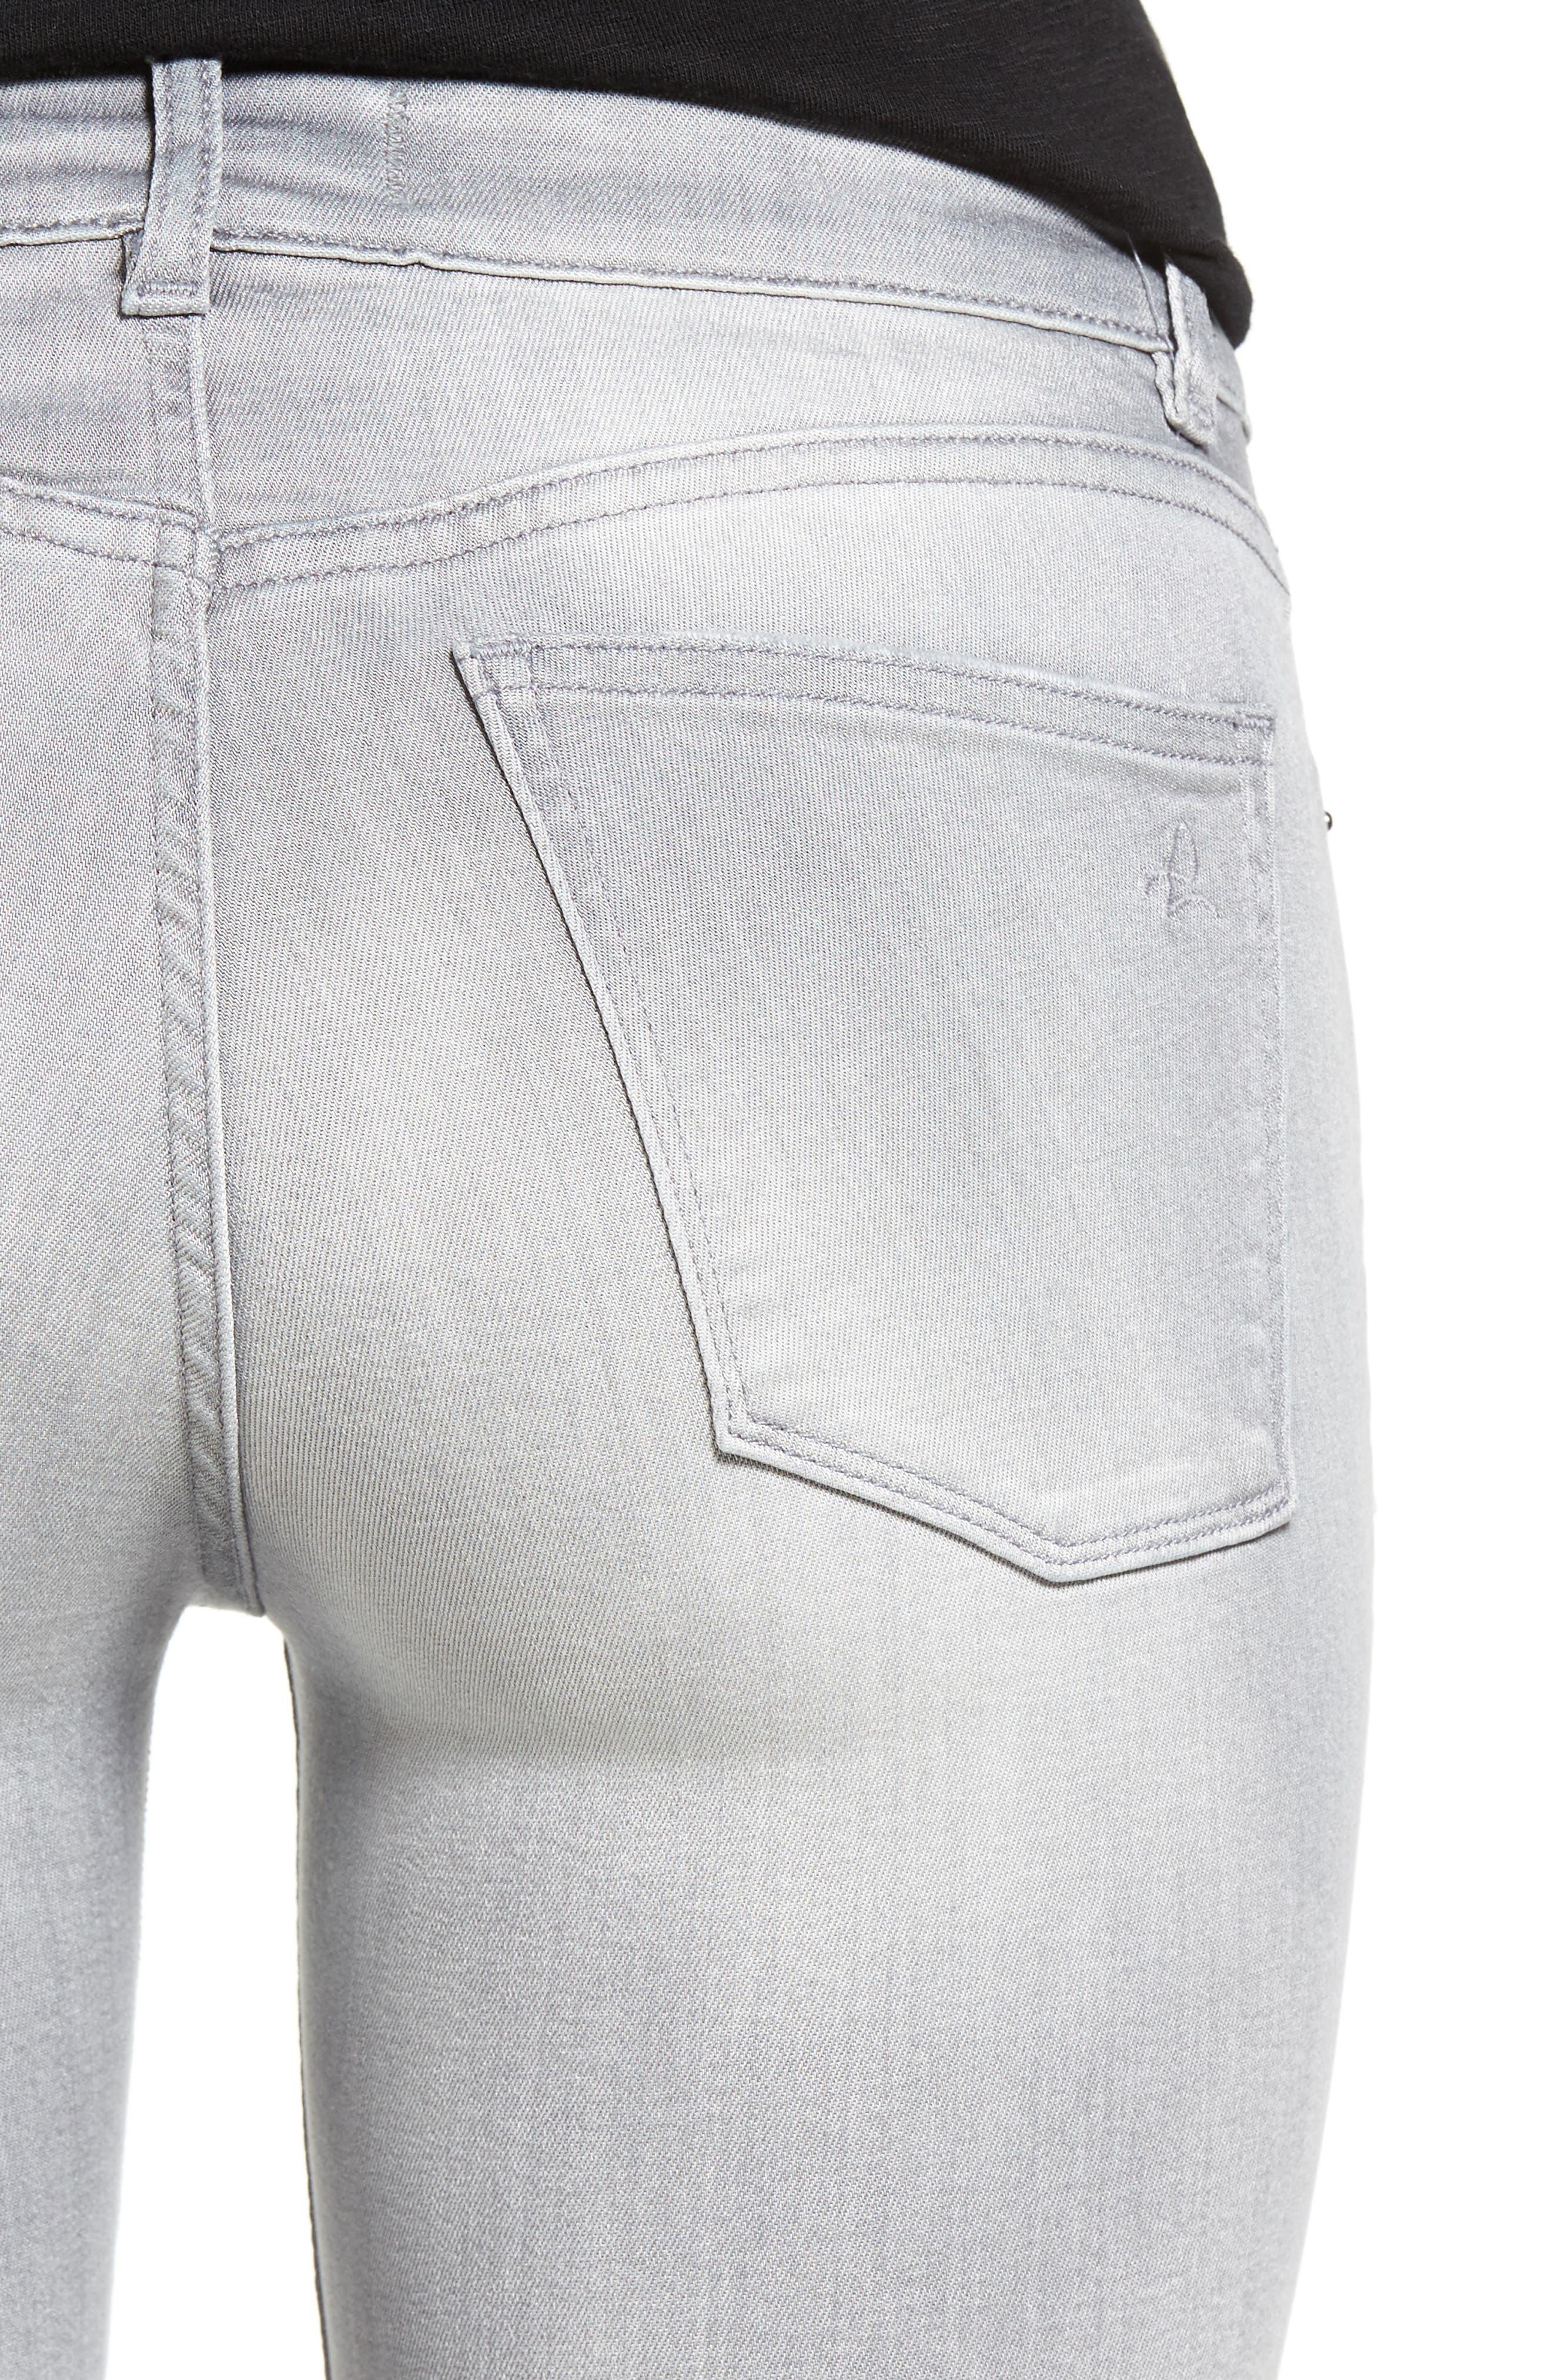 Emma Power Legging Jeans,                             Alternate thumbnail 4, color,                             020